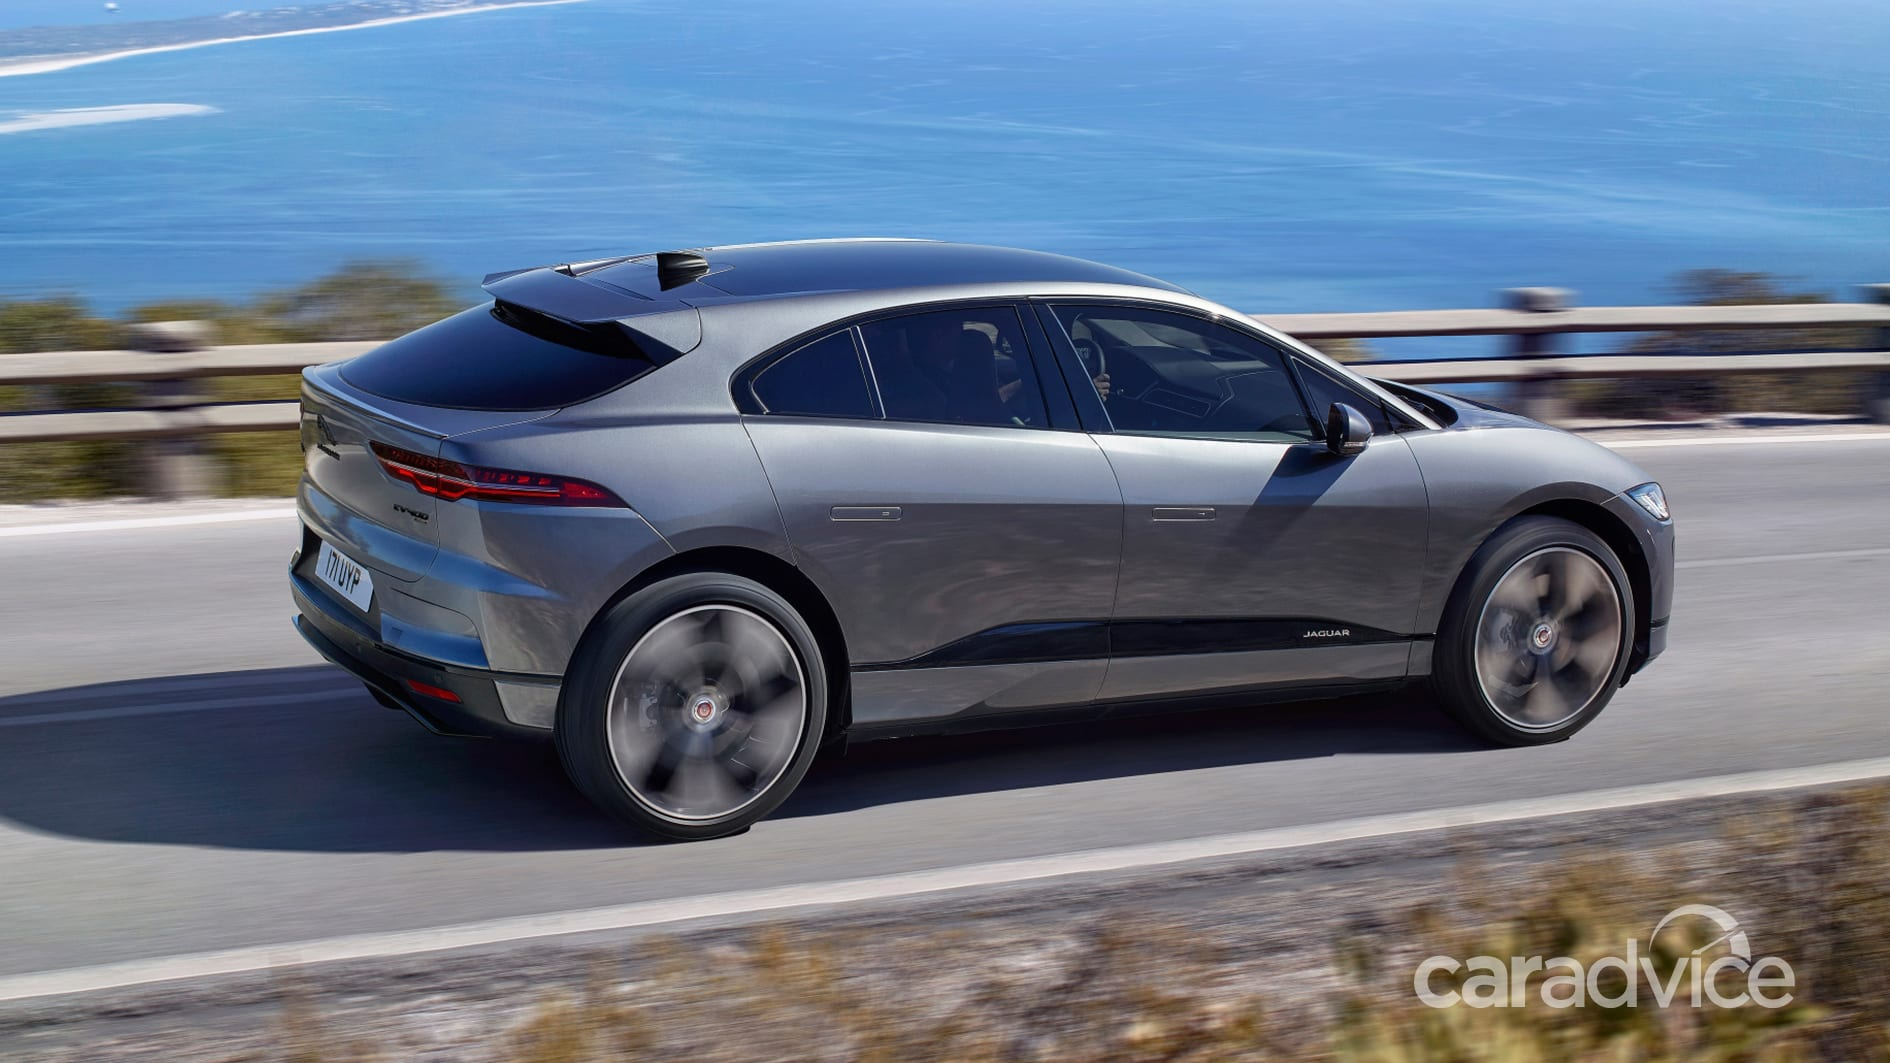 2021 Jaguar I-Pace price and specs | CarAdvice